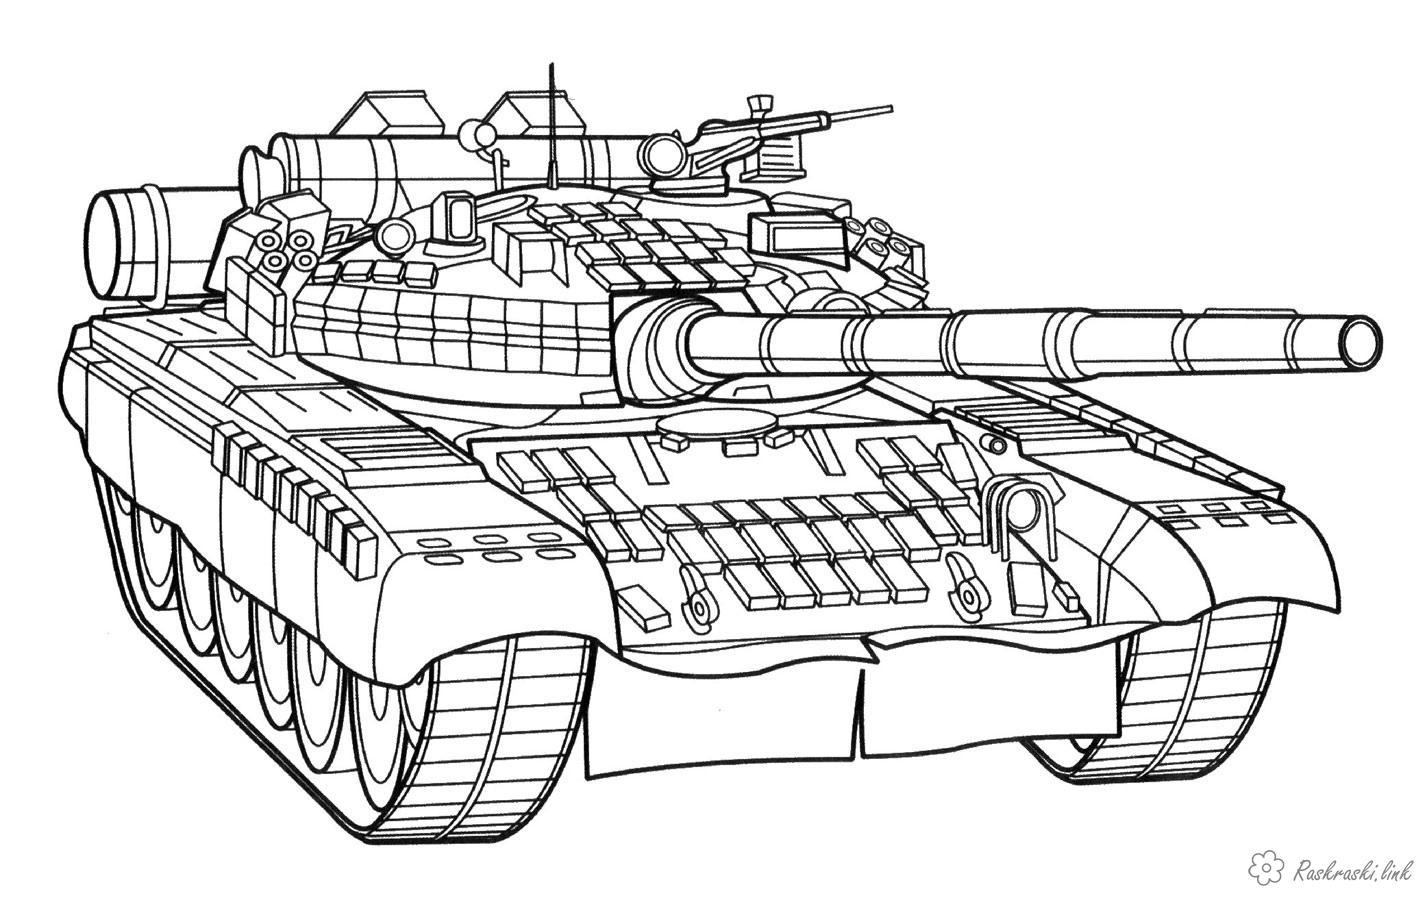 Розмальовки розмальовка Розмальовки сучасні танки, танки Росії, зброя Росии